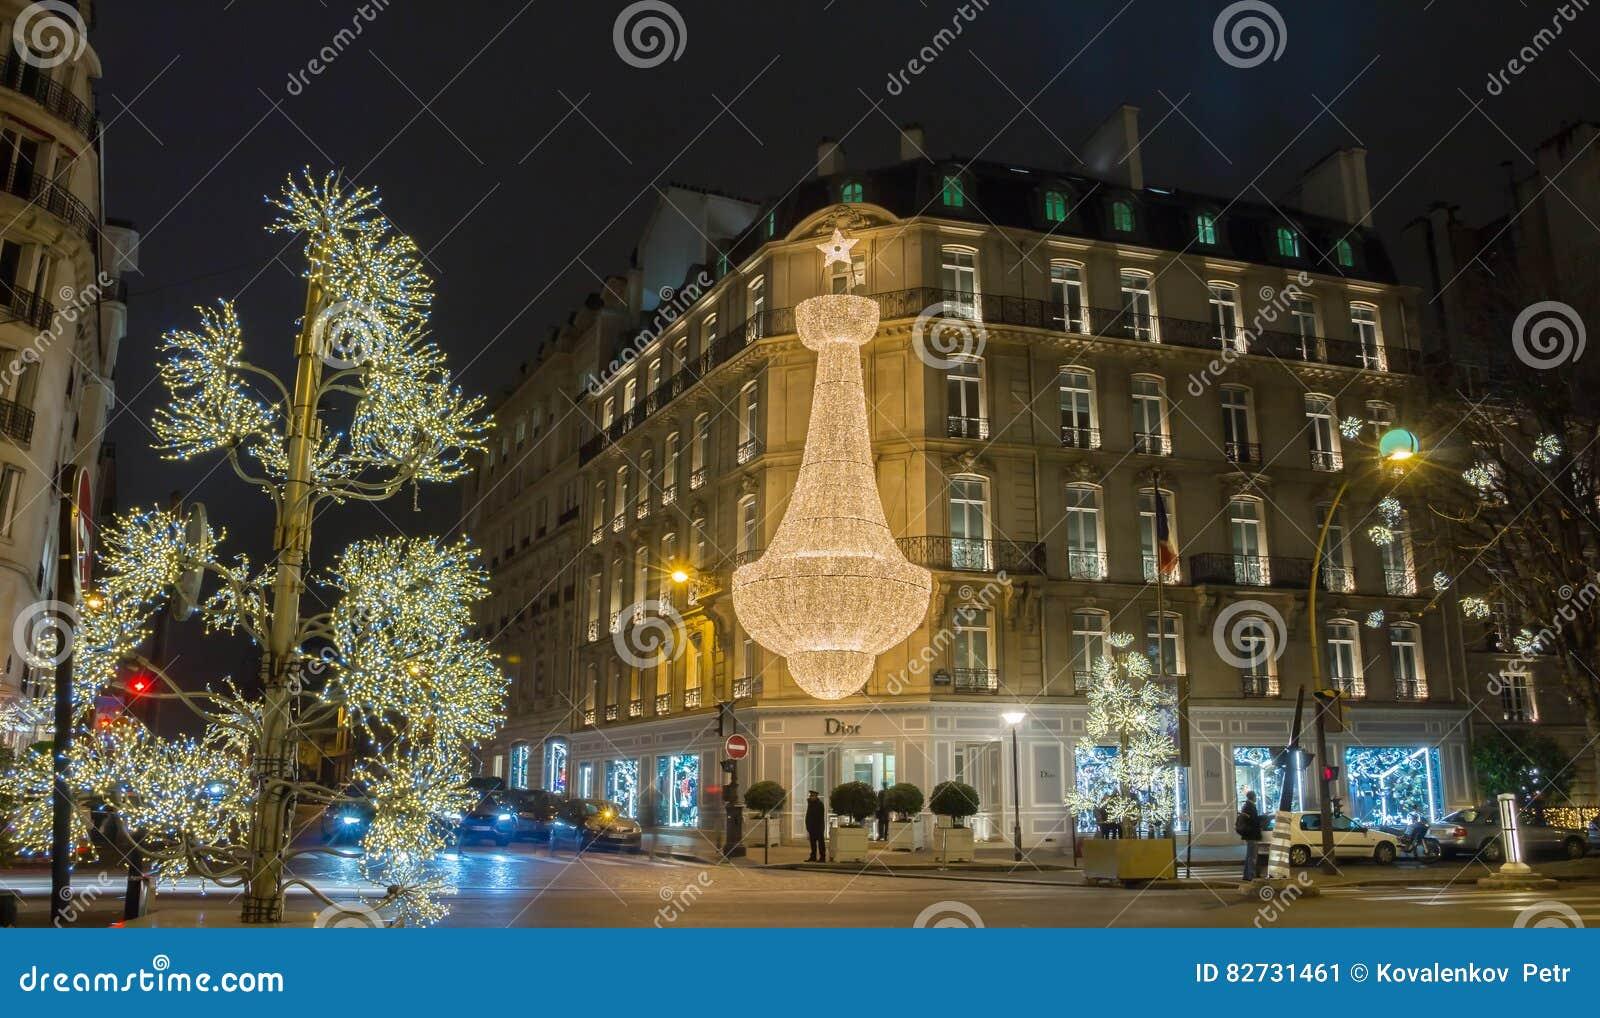 Boutique Dior Dekorerade For Jul Paris Frankrike Redaktionell Bild Bild Av 82731461